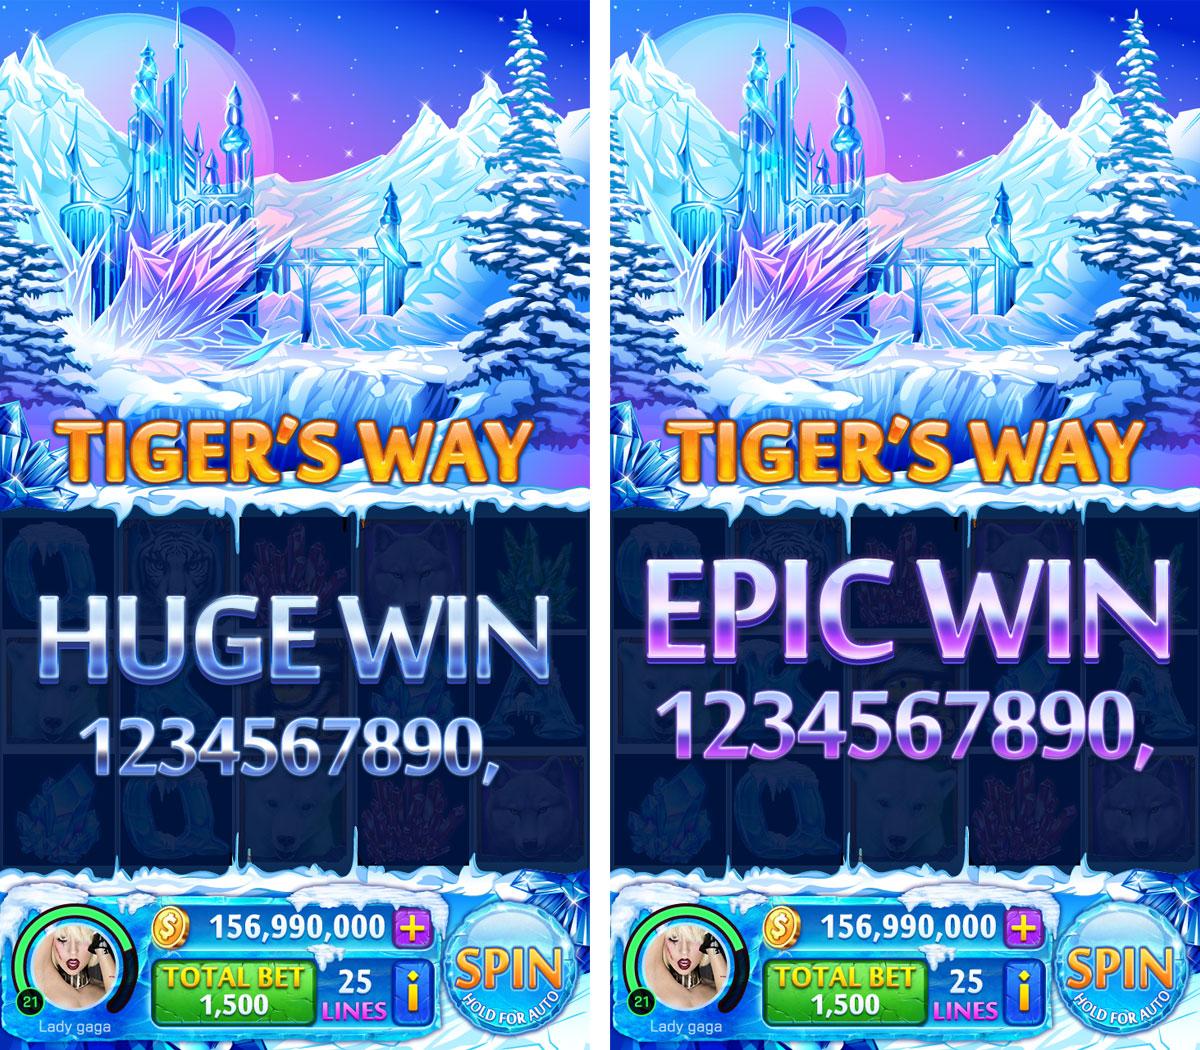 tigers_way_blog_win-2